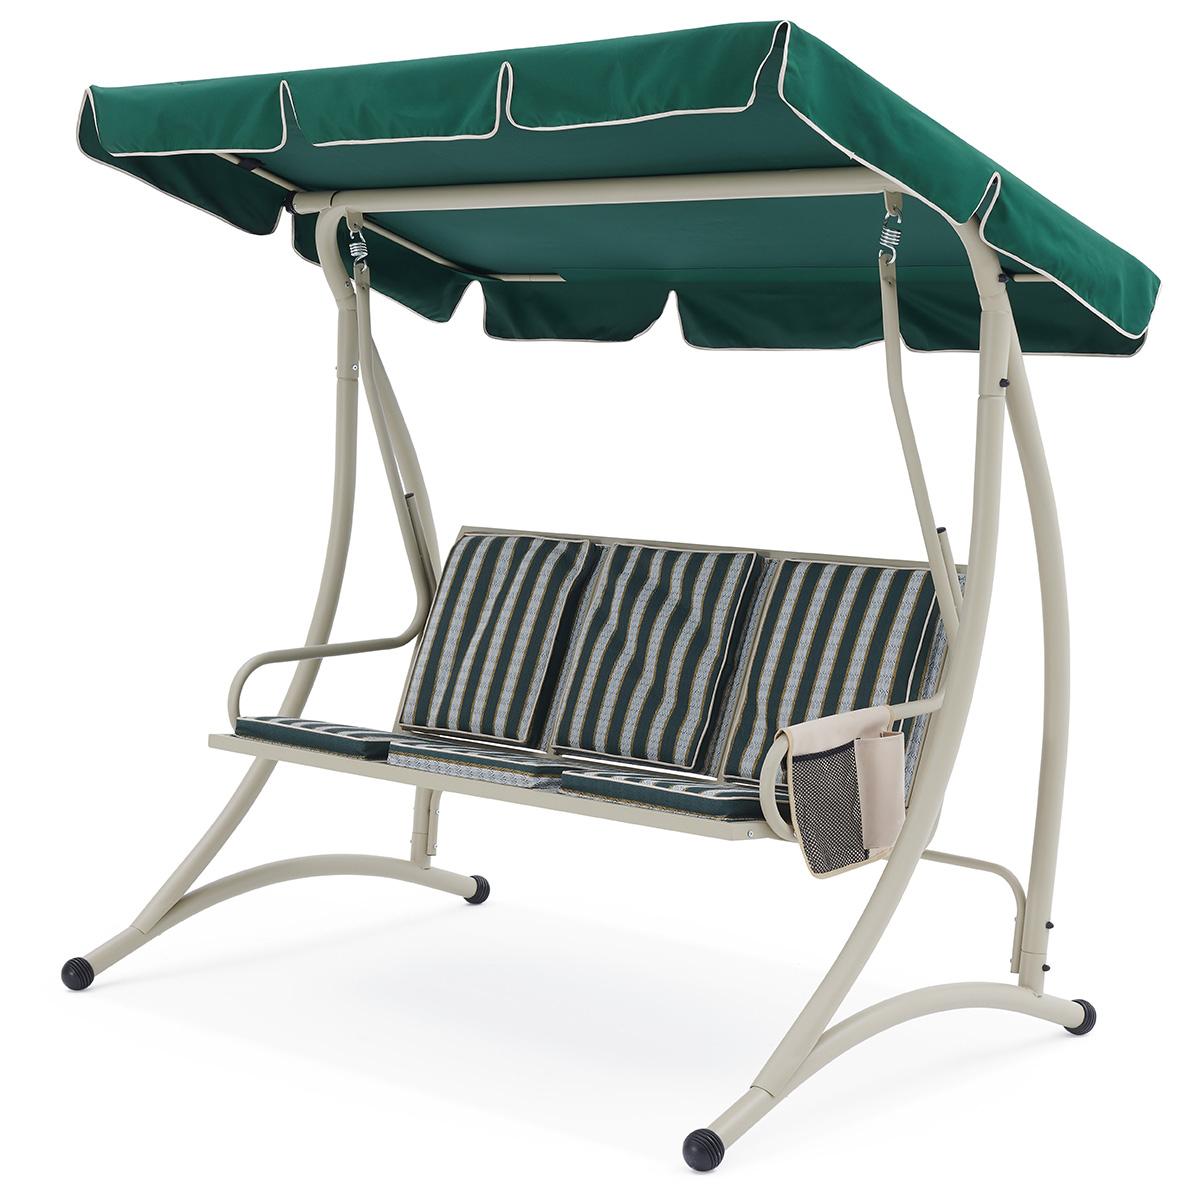 2020 2 Person Gray Steel Outdoor Swings In Korina 3 Seater Swing – أرجوحات – مفروشات في الهواء الطلق (View 22 of 30)